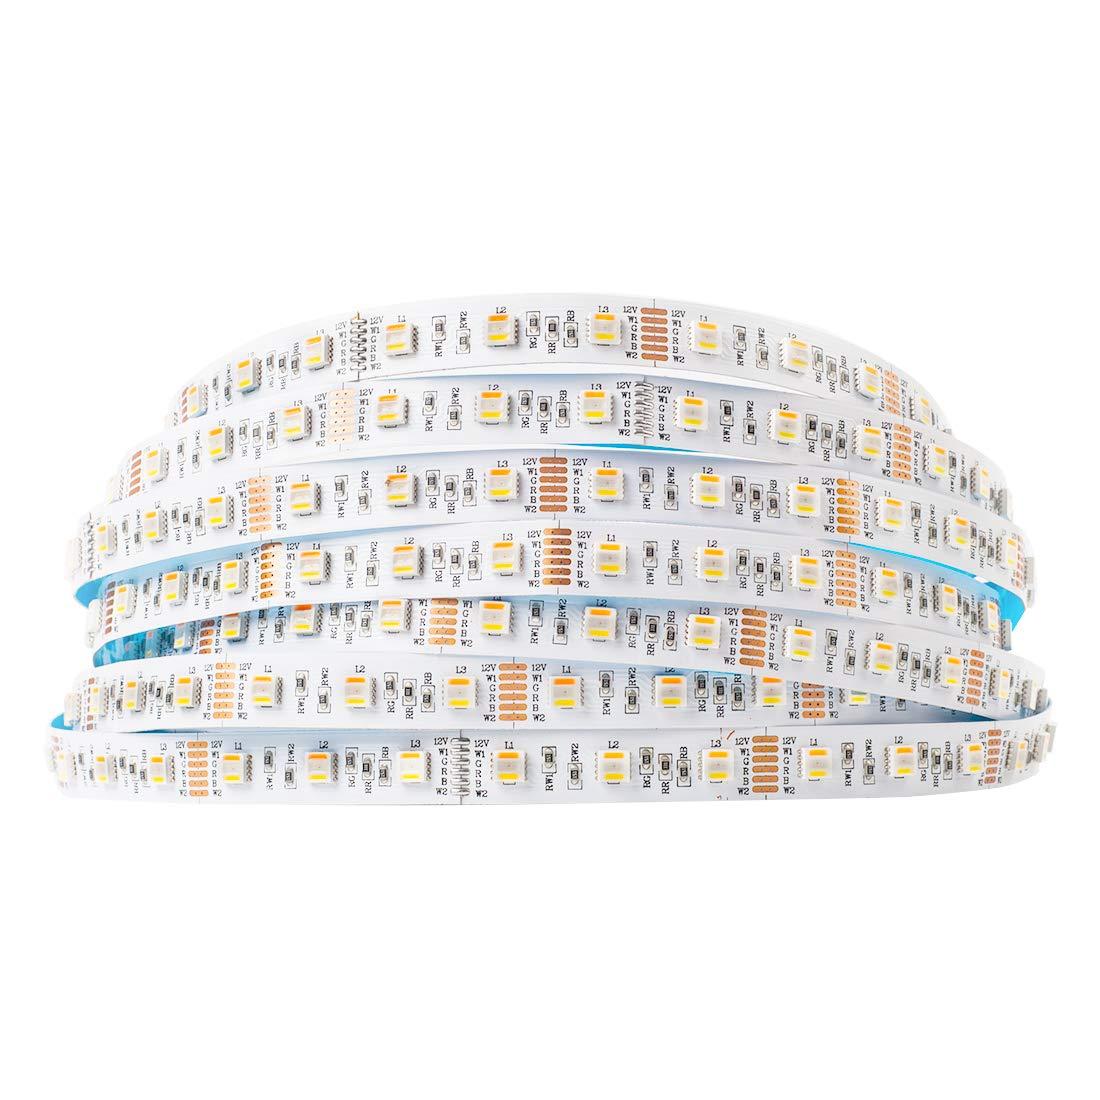 BTF-LIGHTING 5050 RGBWW RGB+Cool White+Warm White 5 Colors in 1 LED 5m 16.4ft 60LEDs/m Multi-Colored LED Tape Lights IP30 Non-Waterproof DC12V